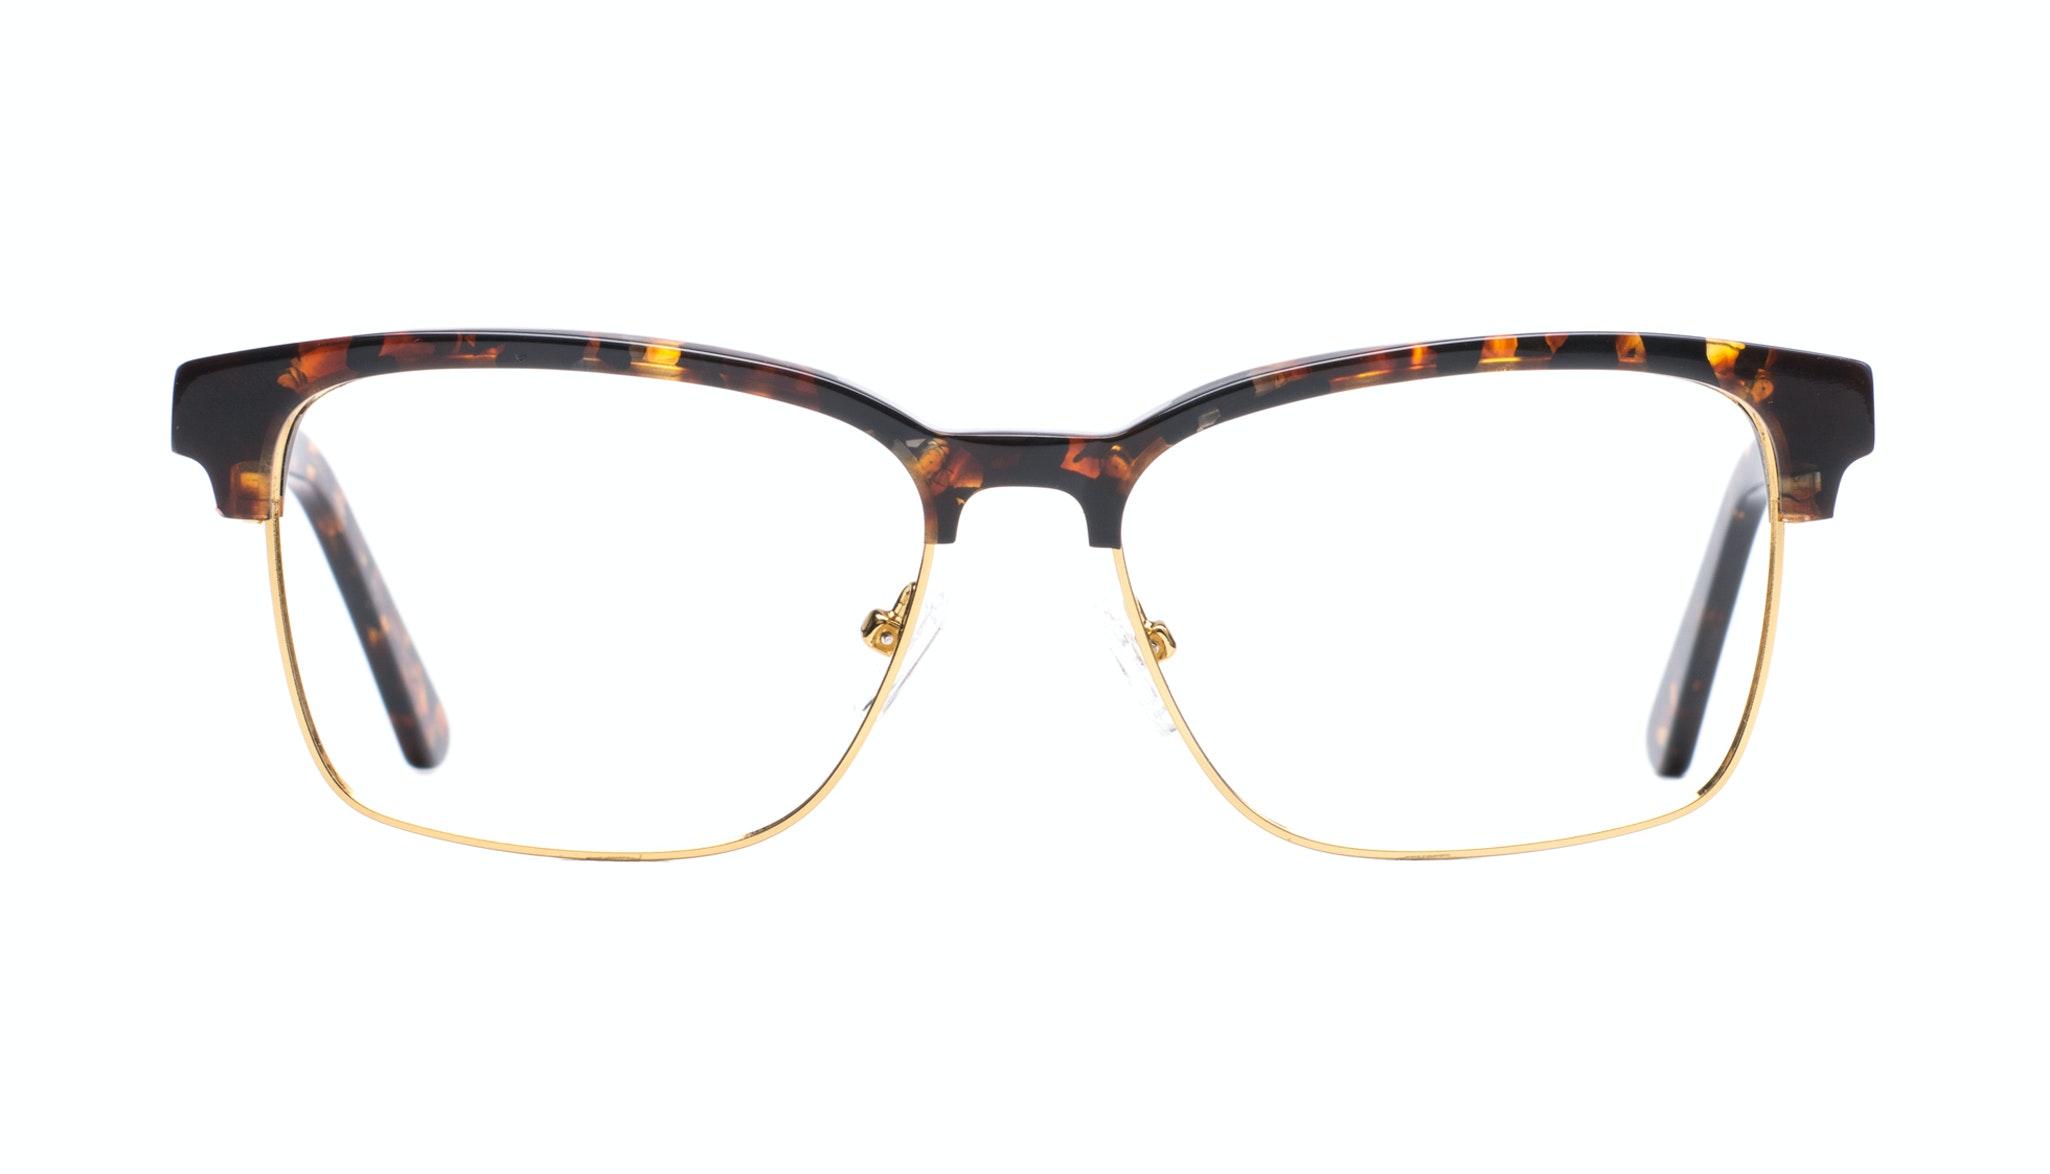 Affordable Fashion Glasses Rectangle Square Eyeglasses Men Gallery Mahogany